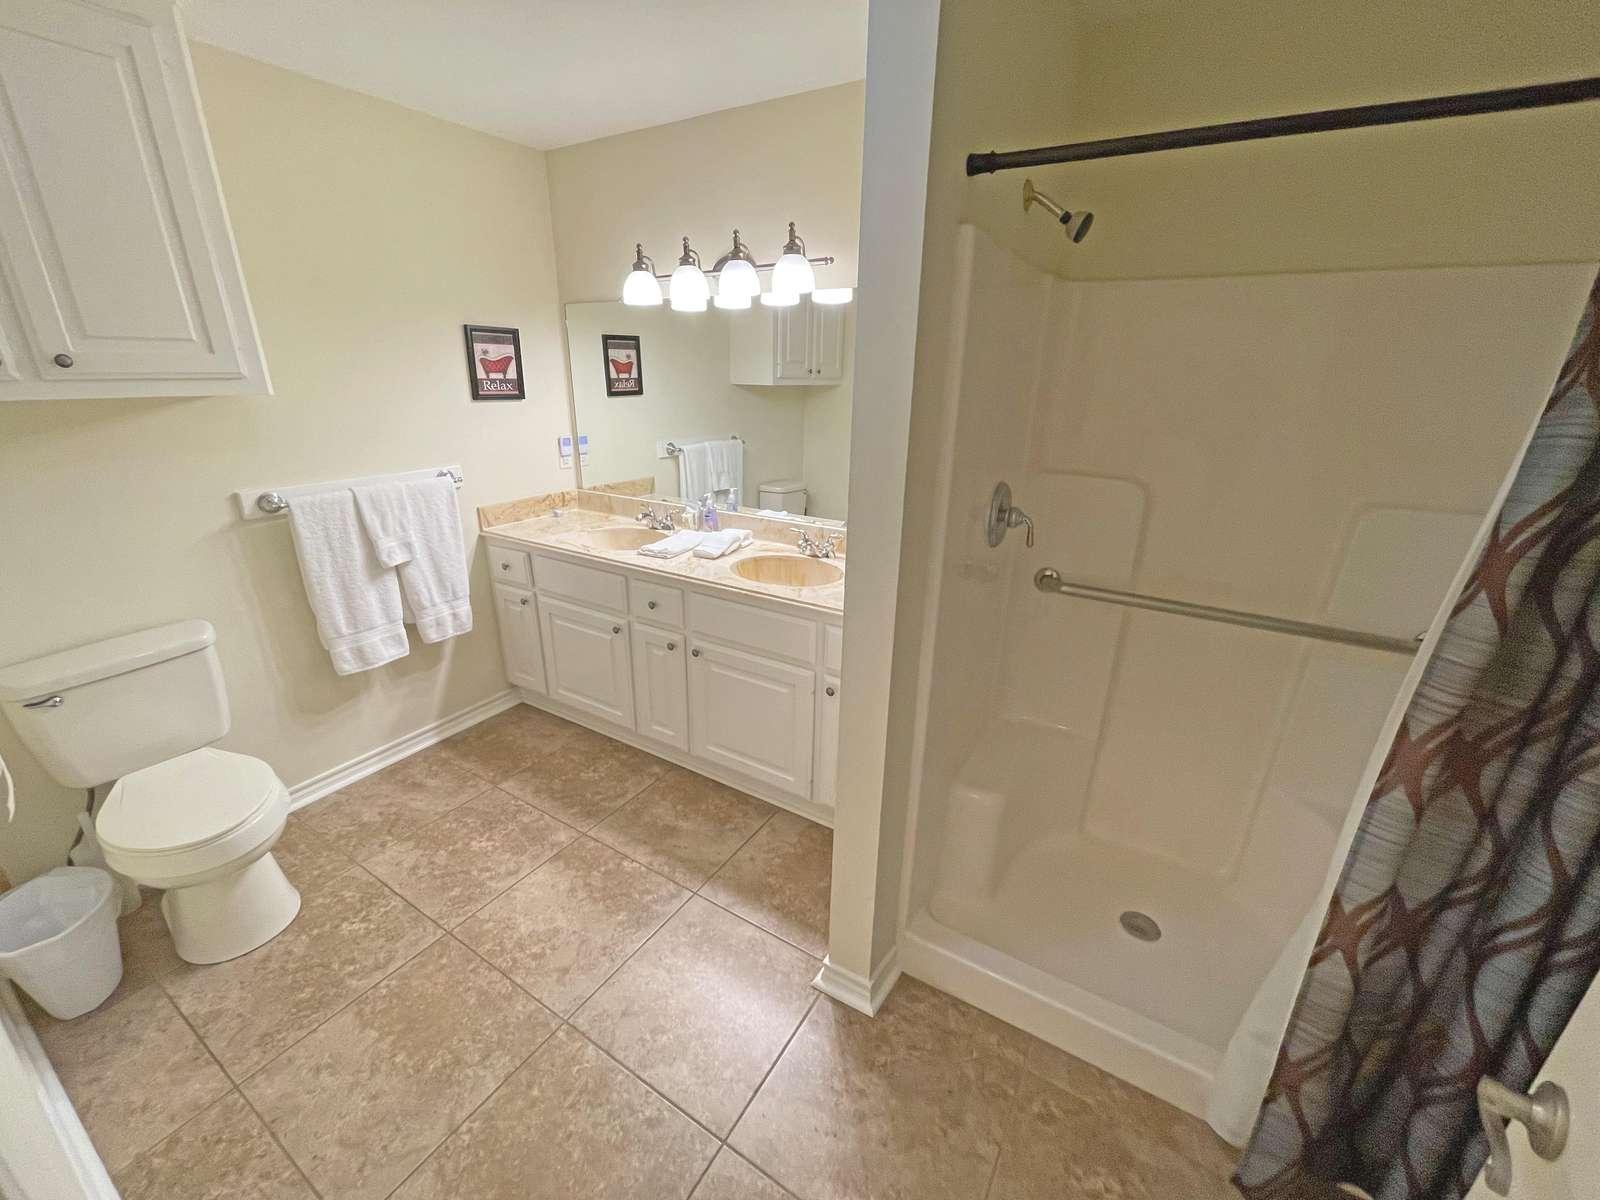 The Lower hall bathroom